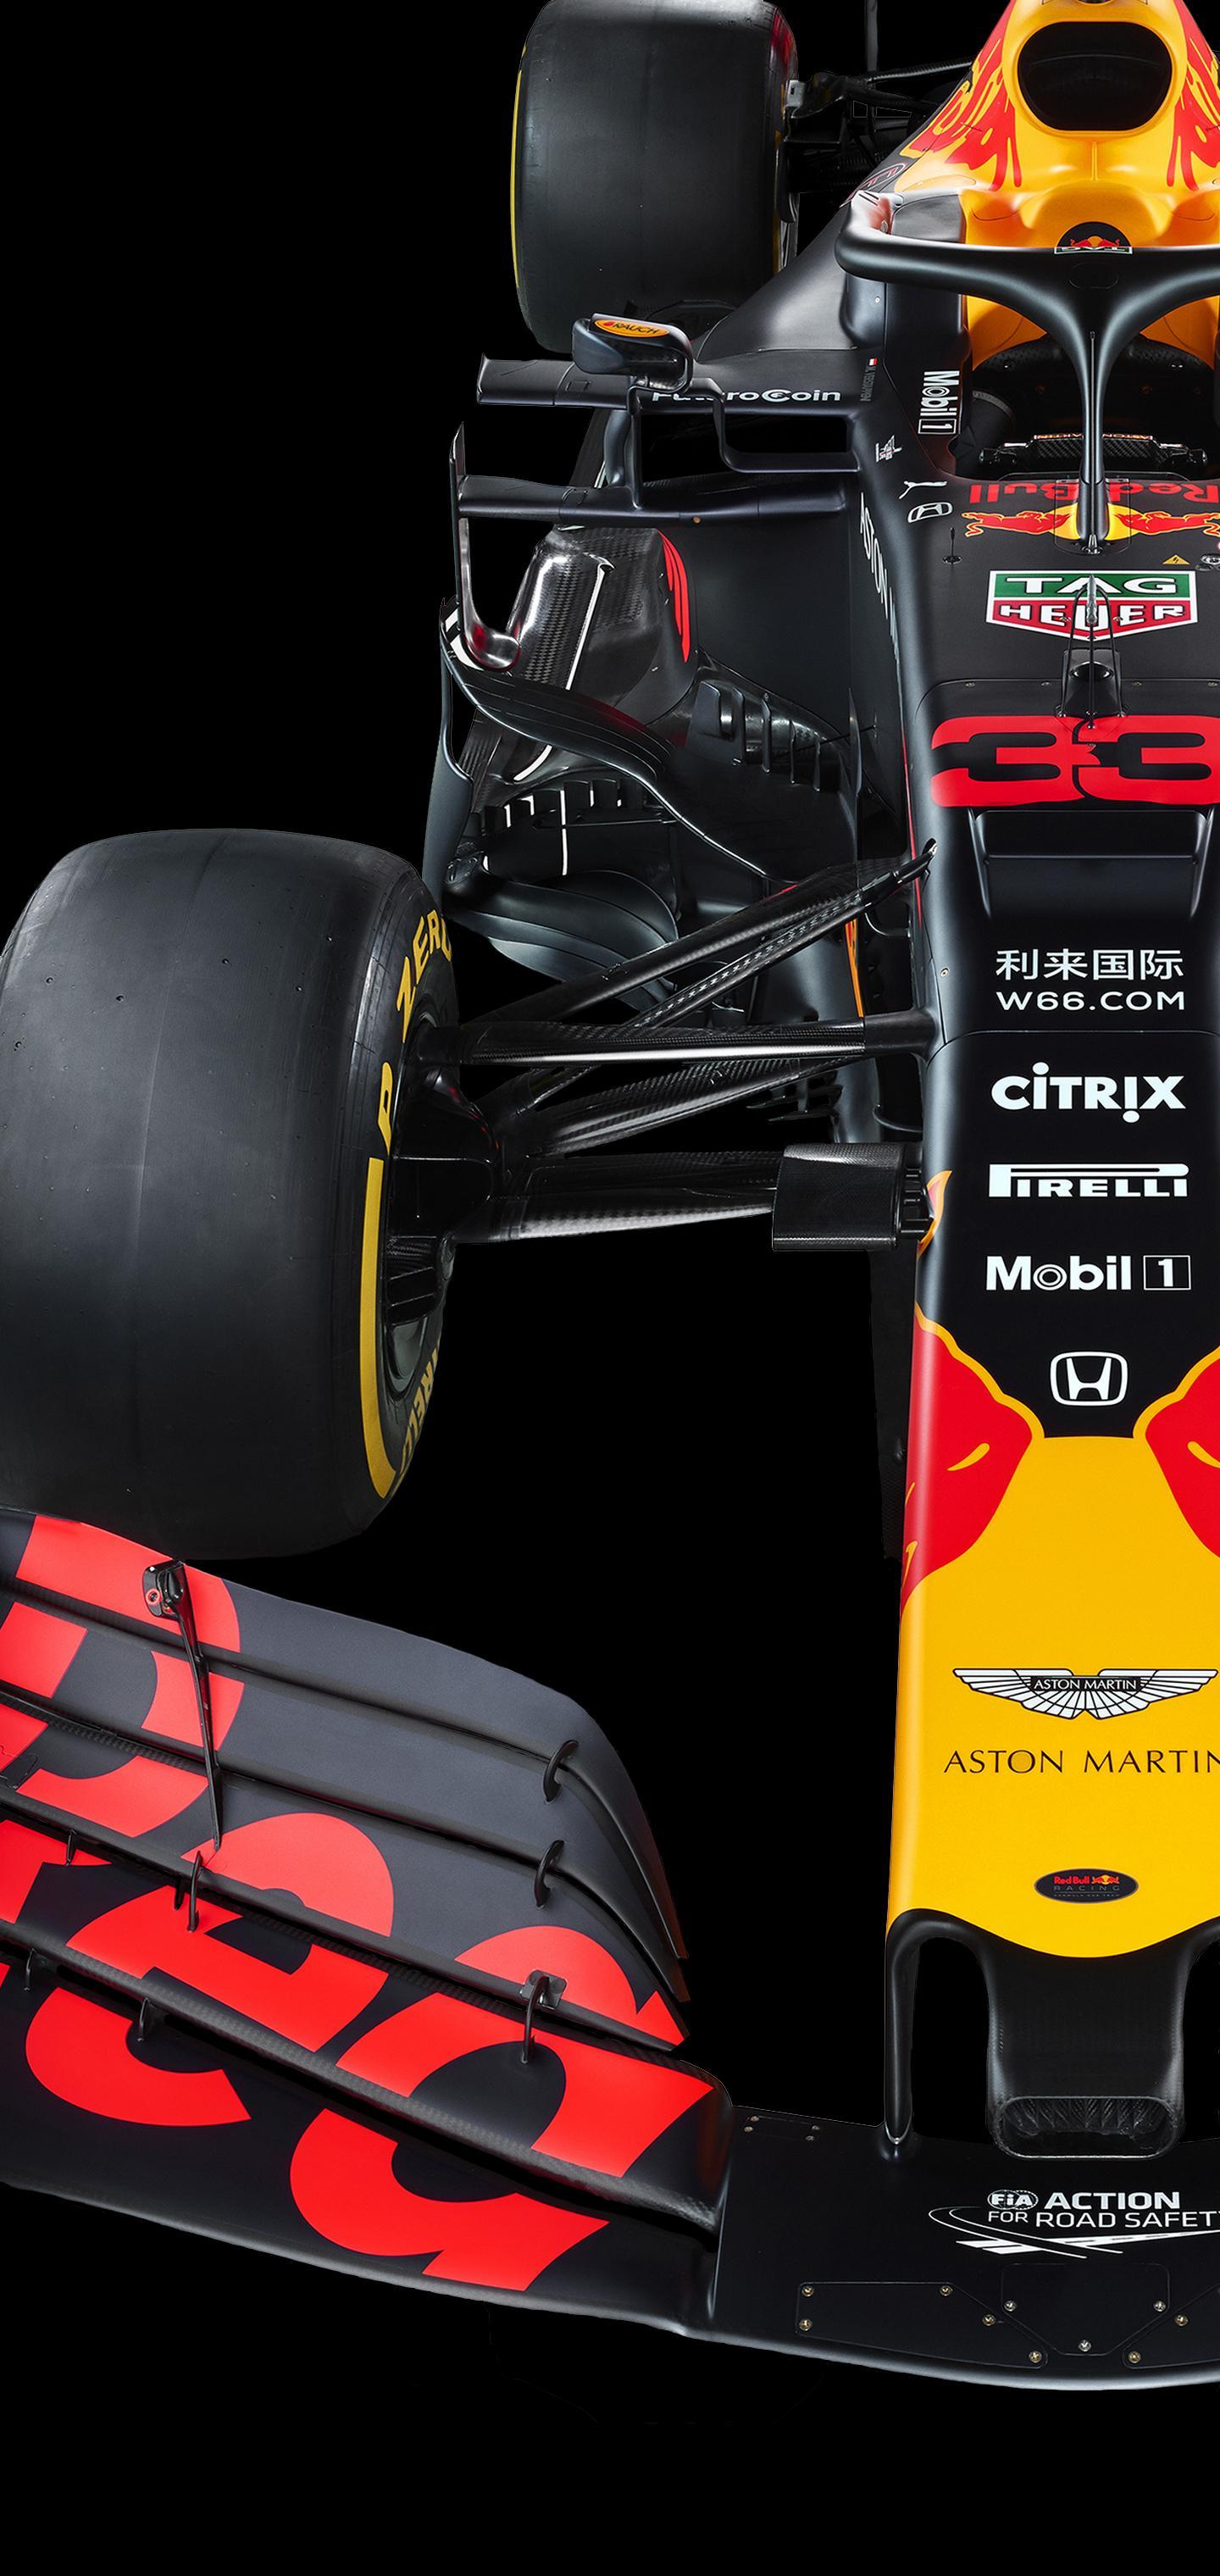 Red Bull F1 Wallpaper S10 1440x3040 Wallpaper Teahub Io